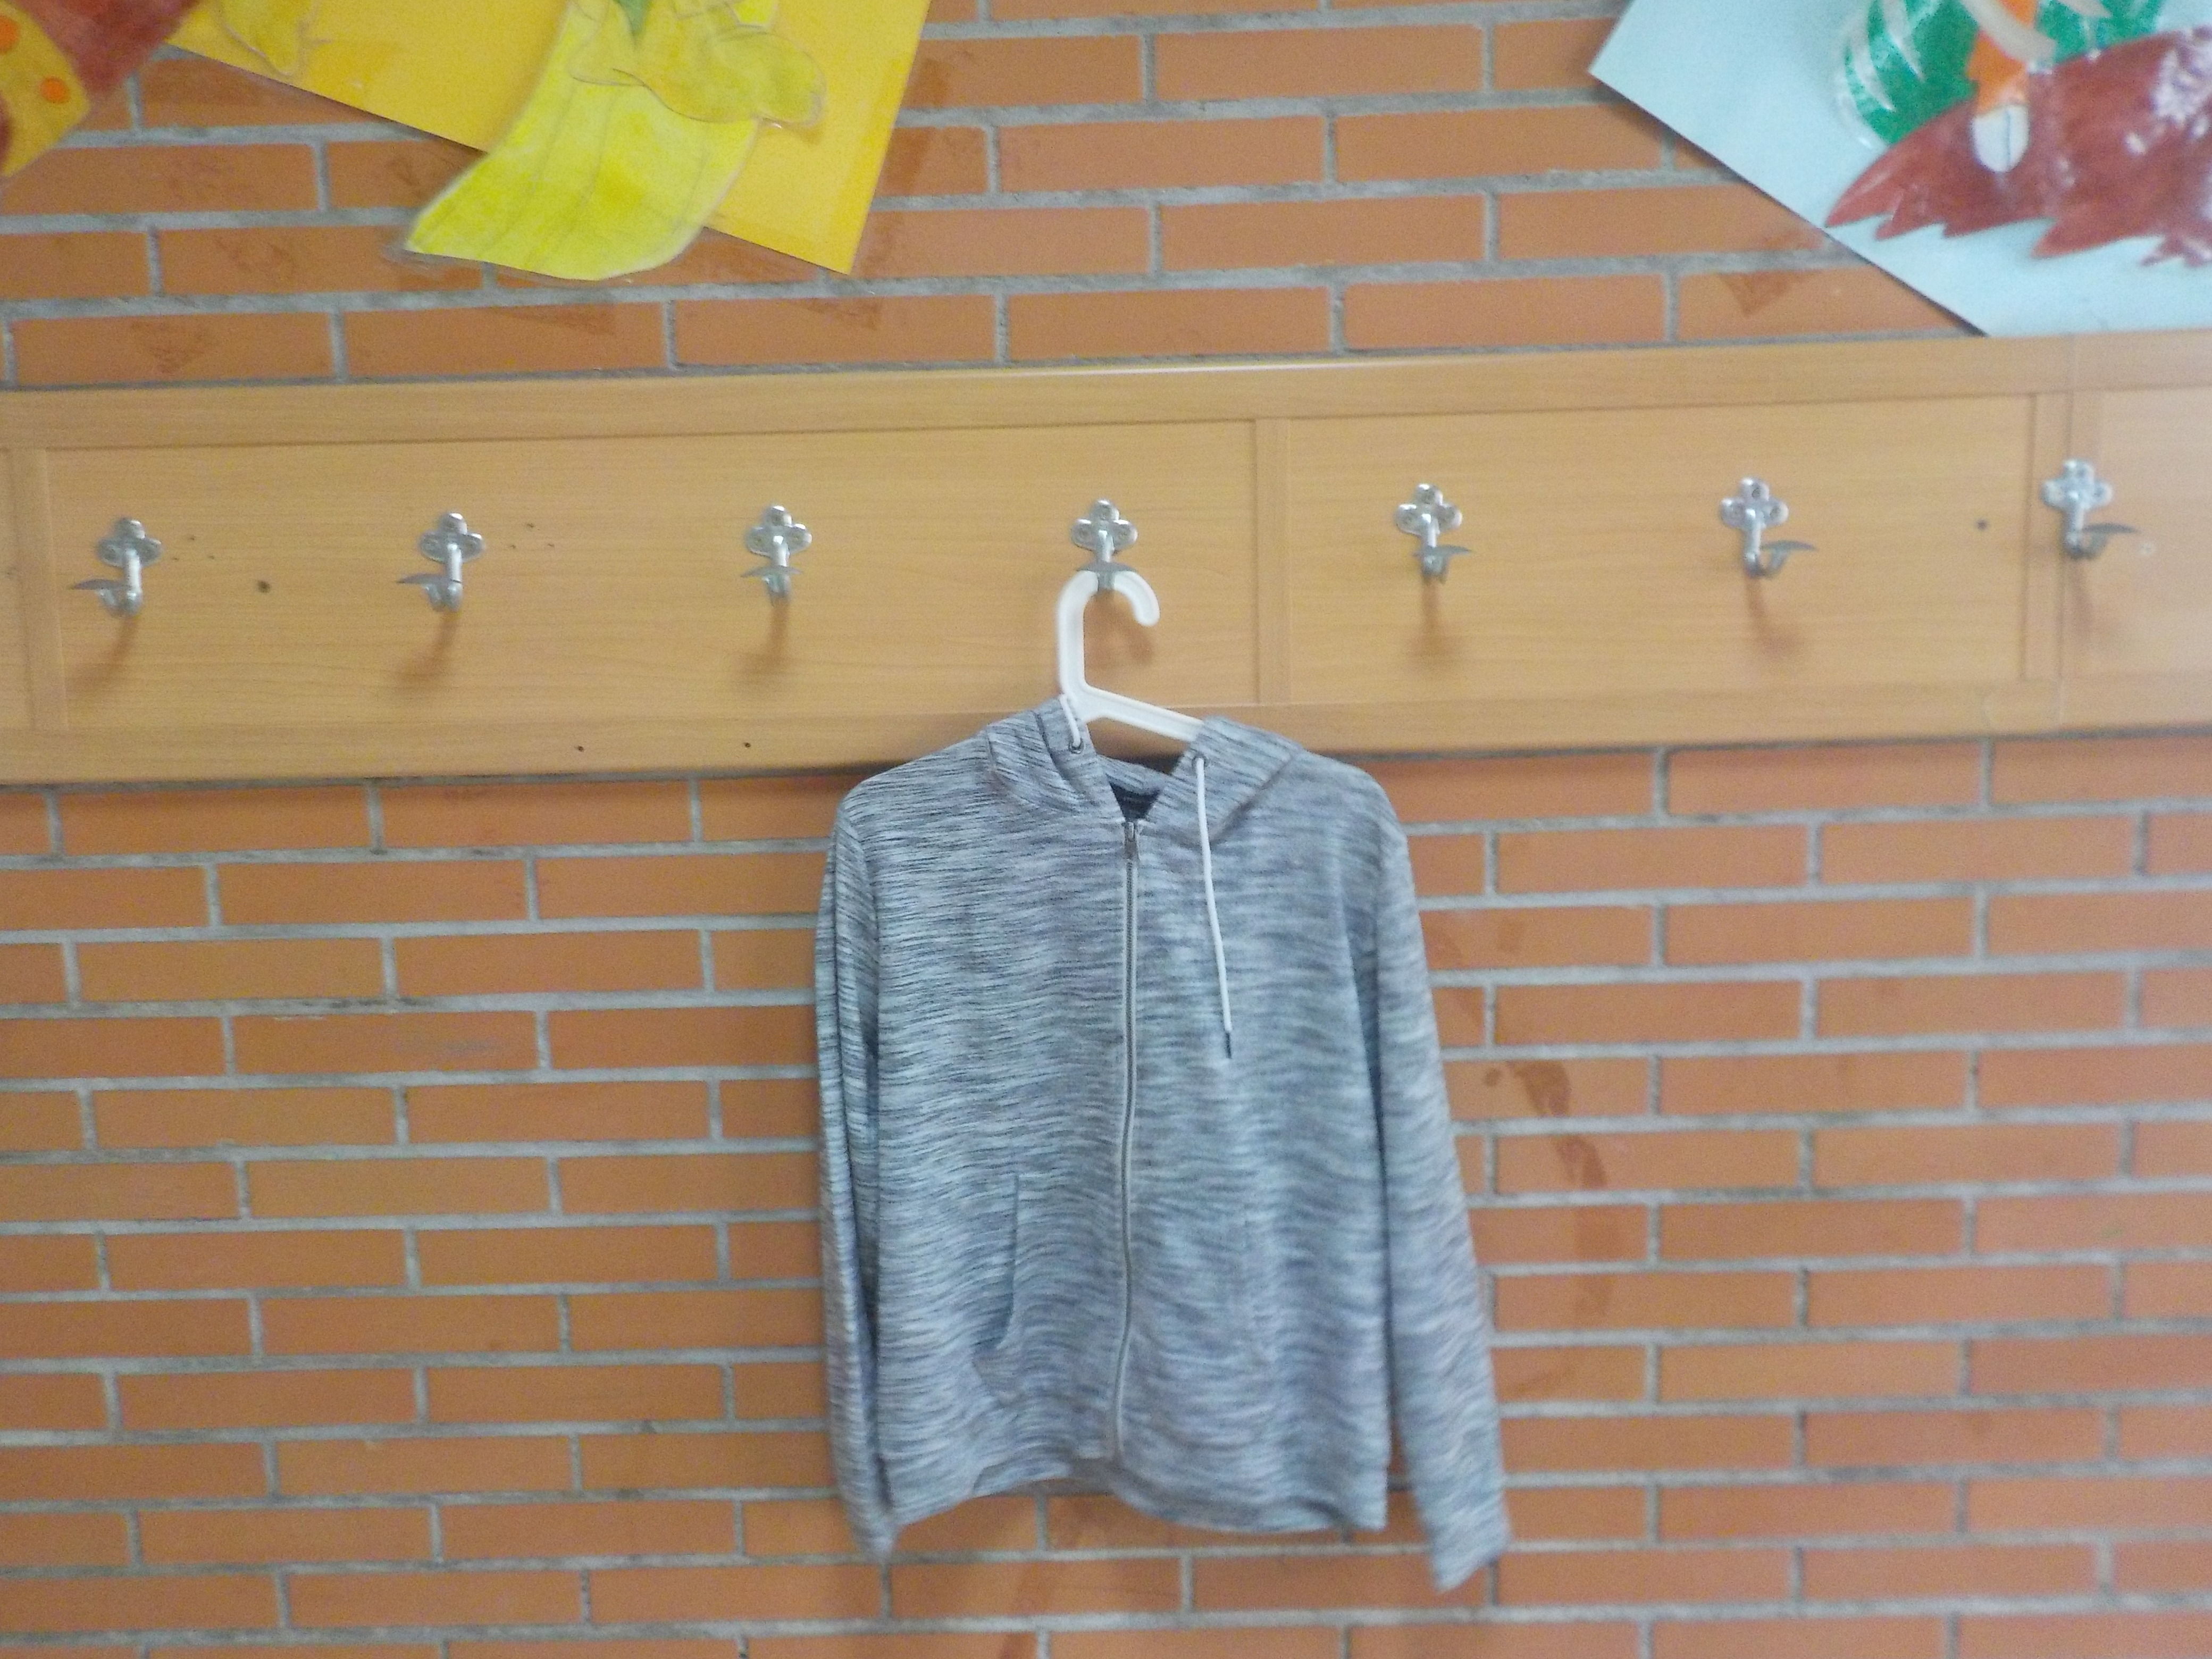 Catalogo de ropa olvidada 1  2018 18